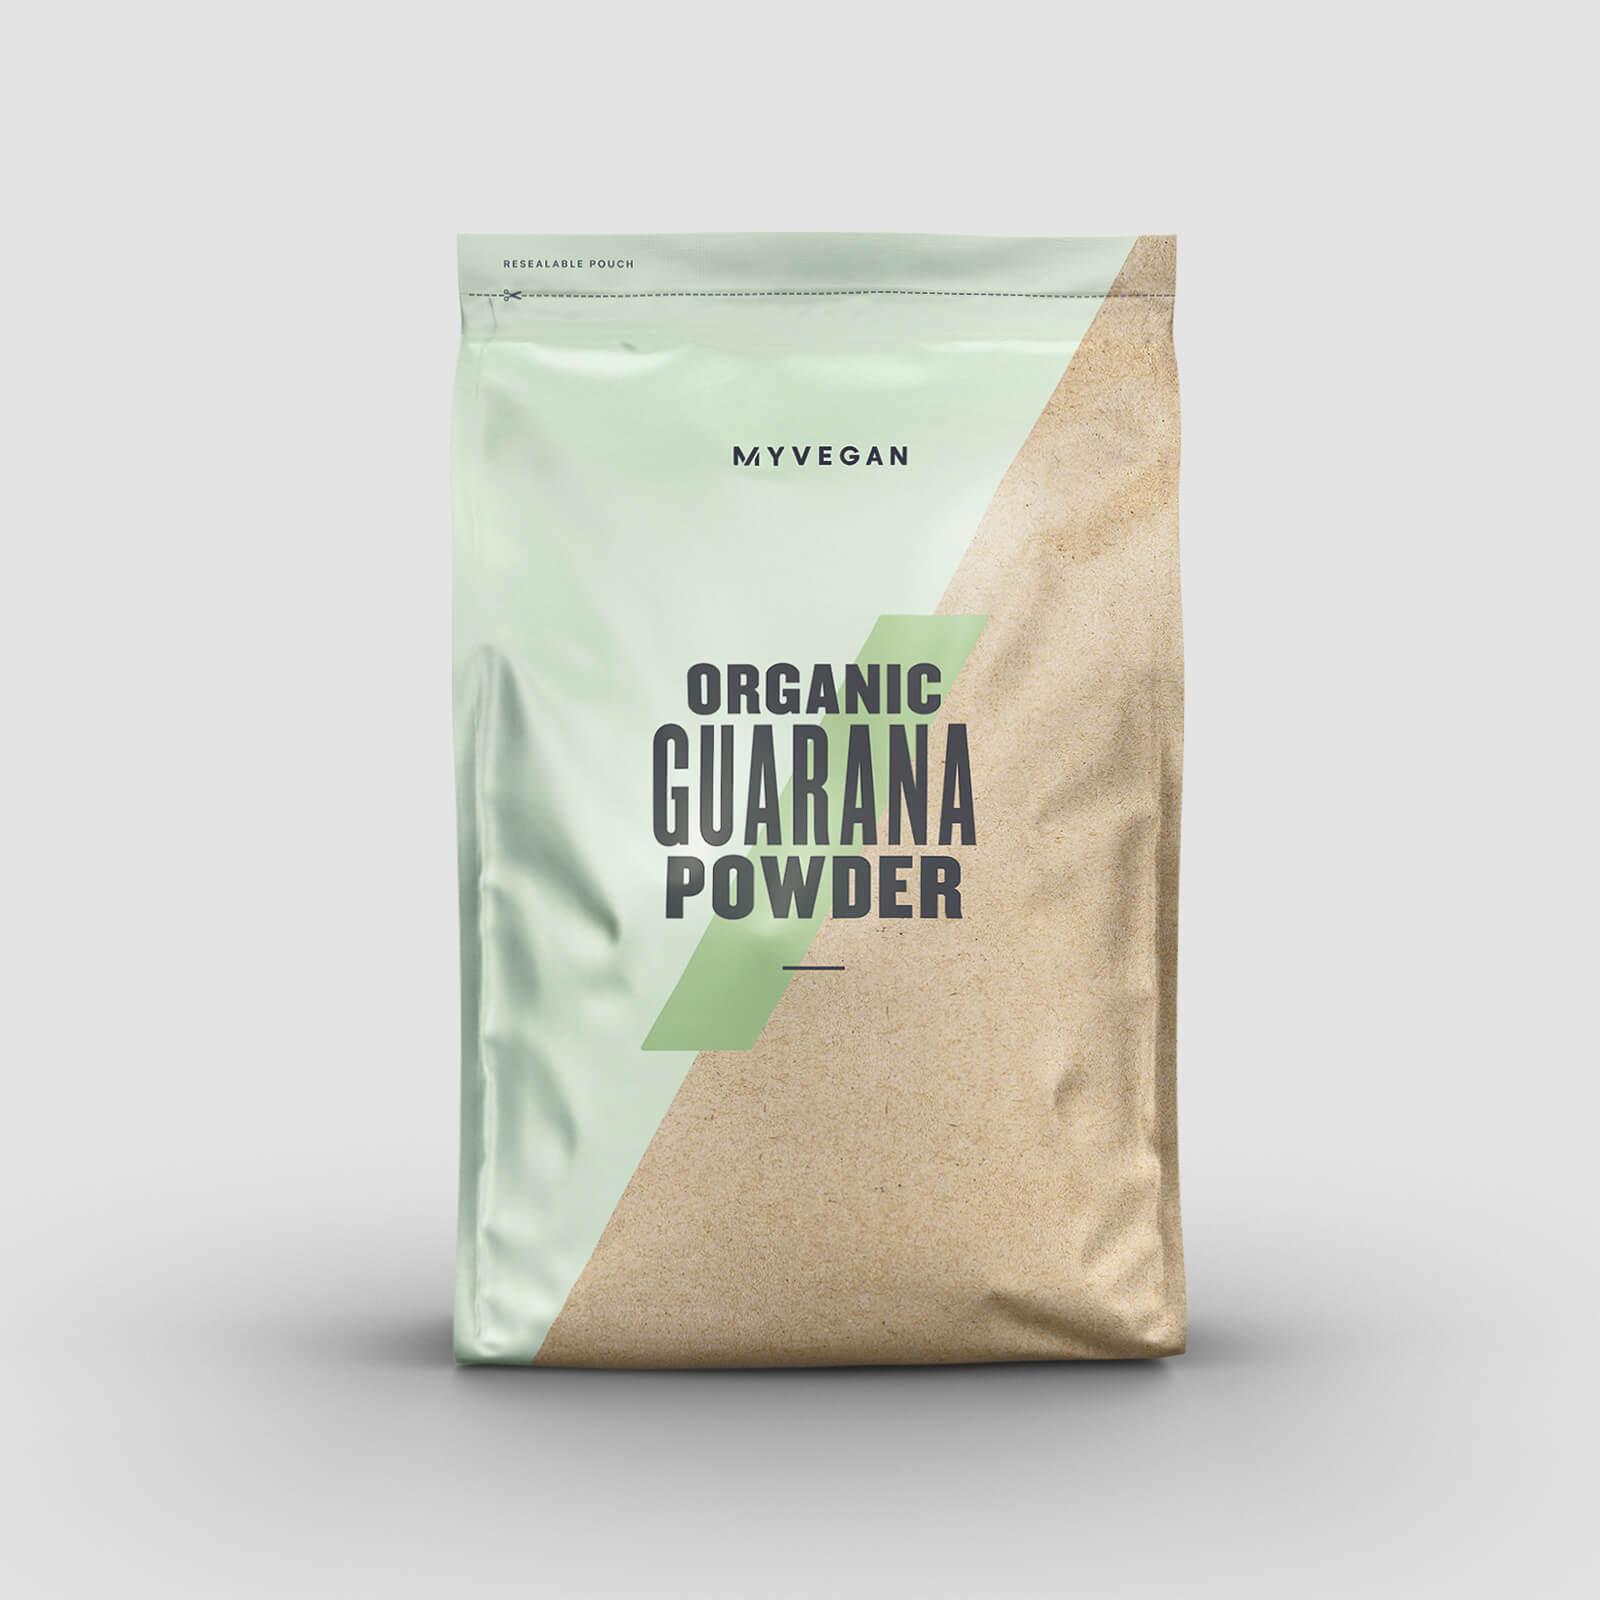 Myprotein Poudre de guarana bio - 100g - Sans arôme ajouté